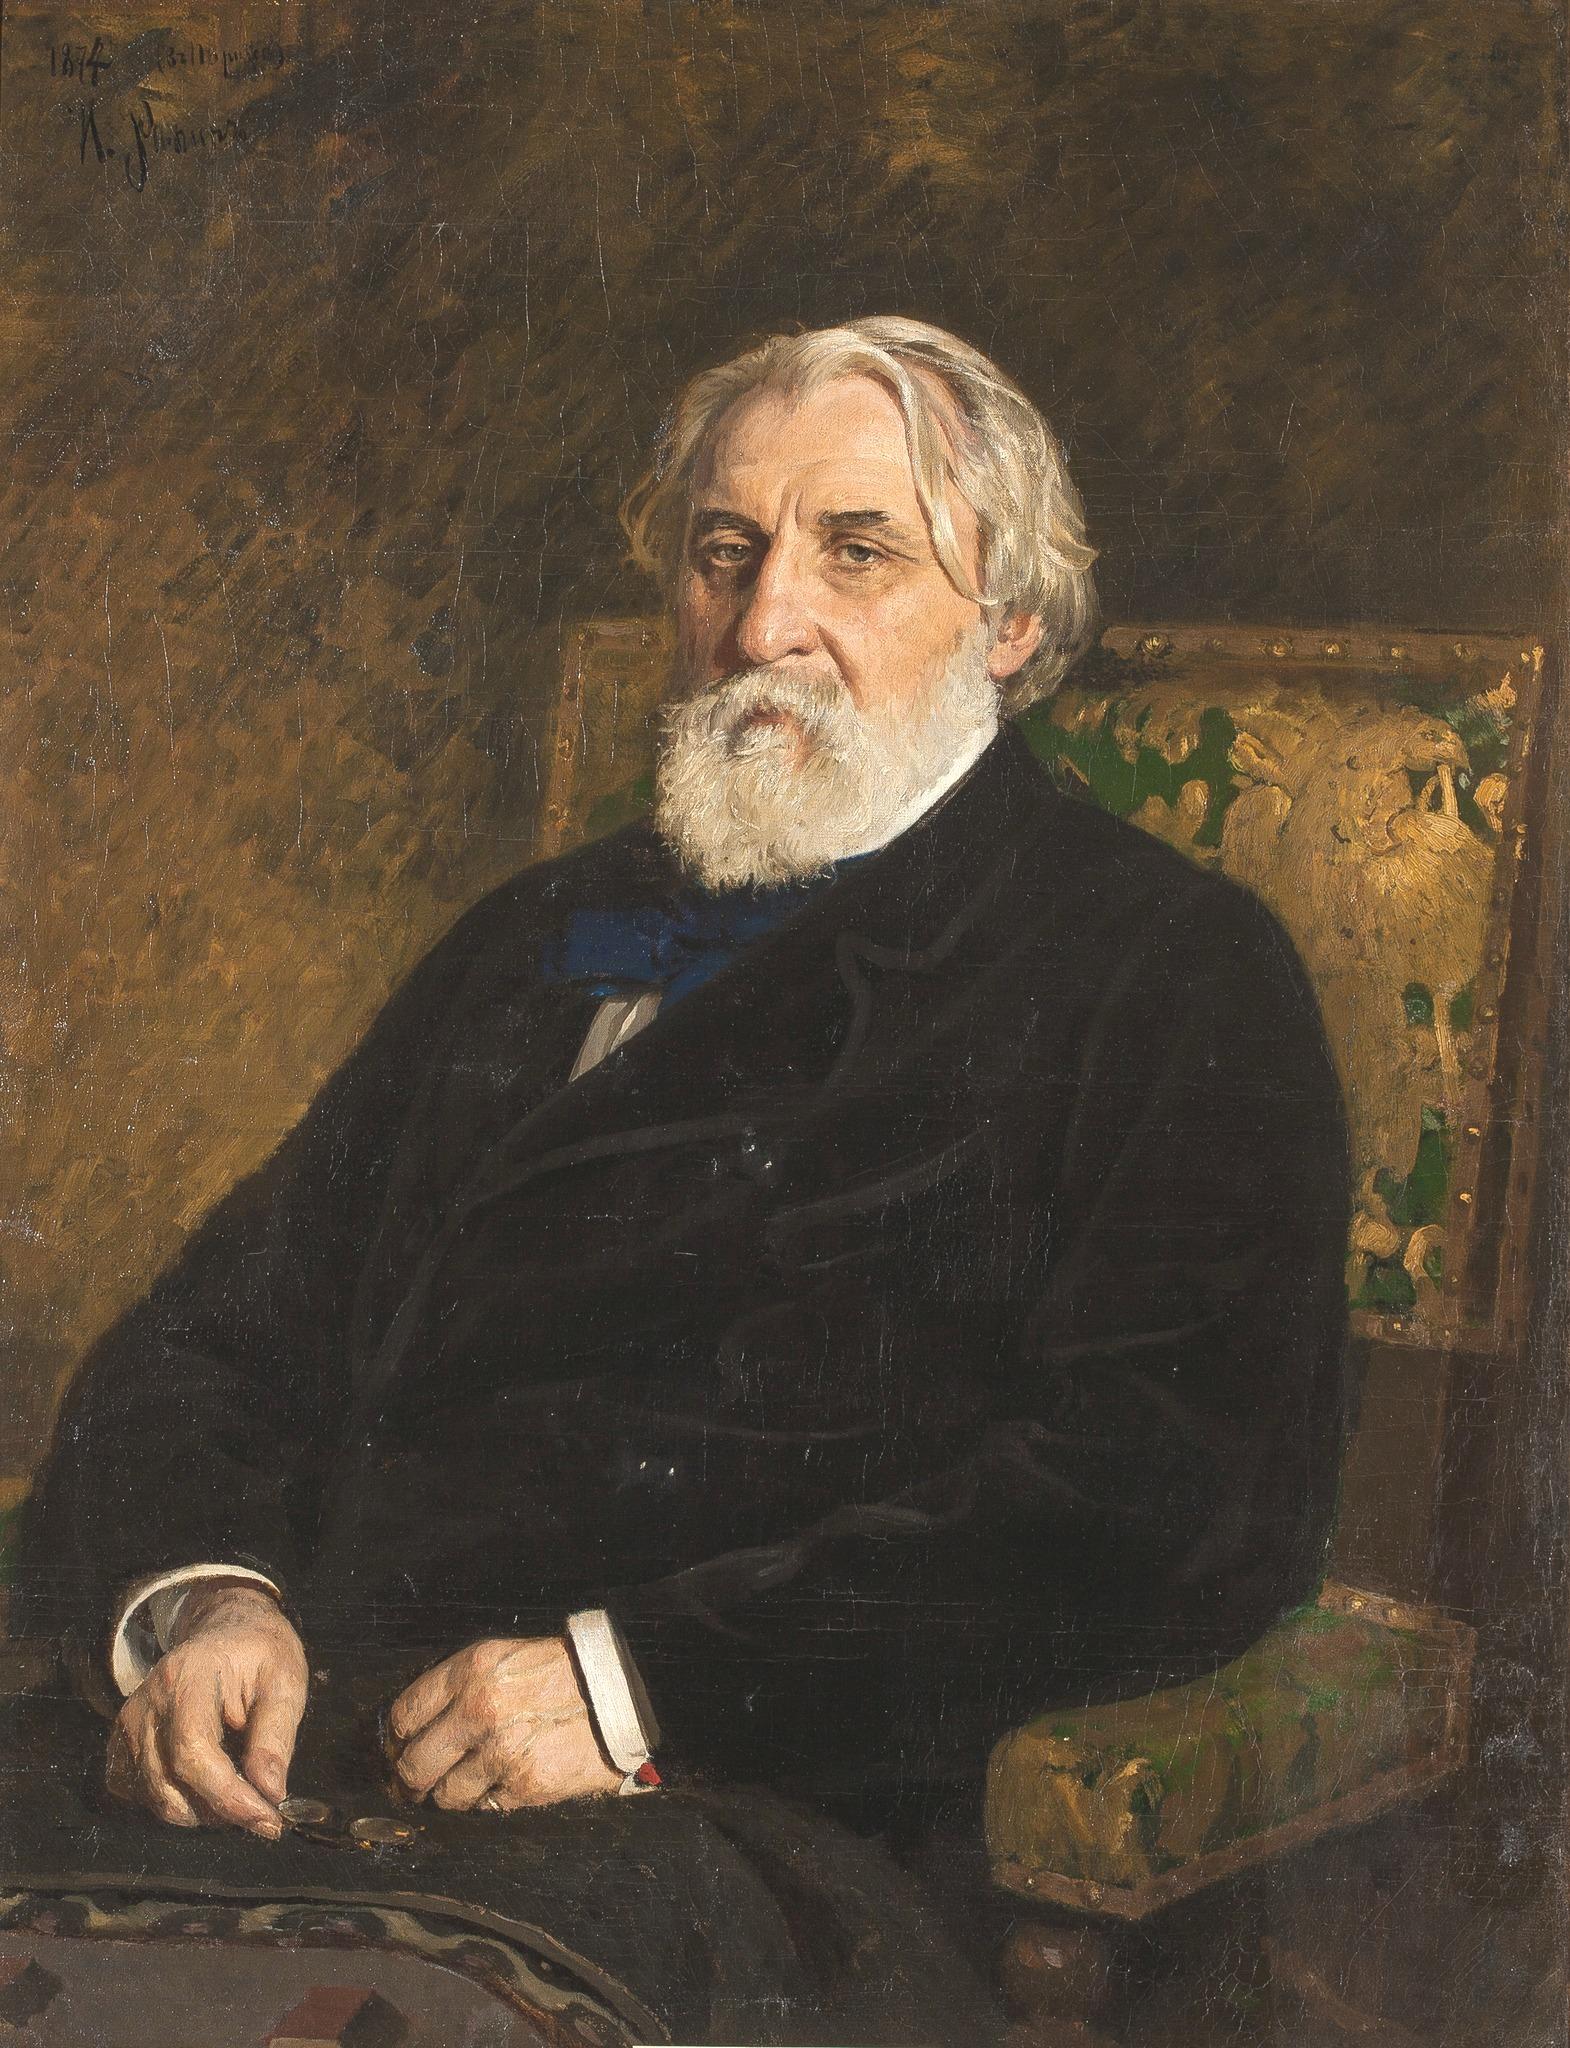 Iwan Sergejewitsch Turgenew  Wikipedia